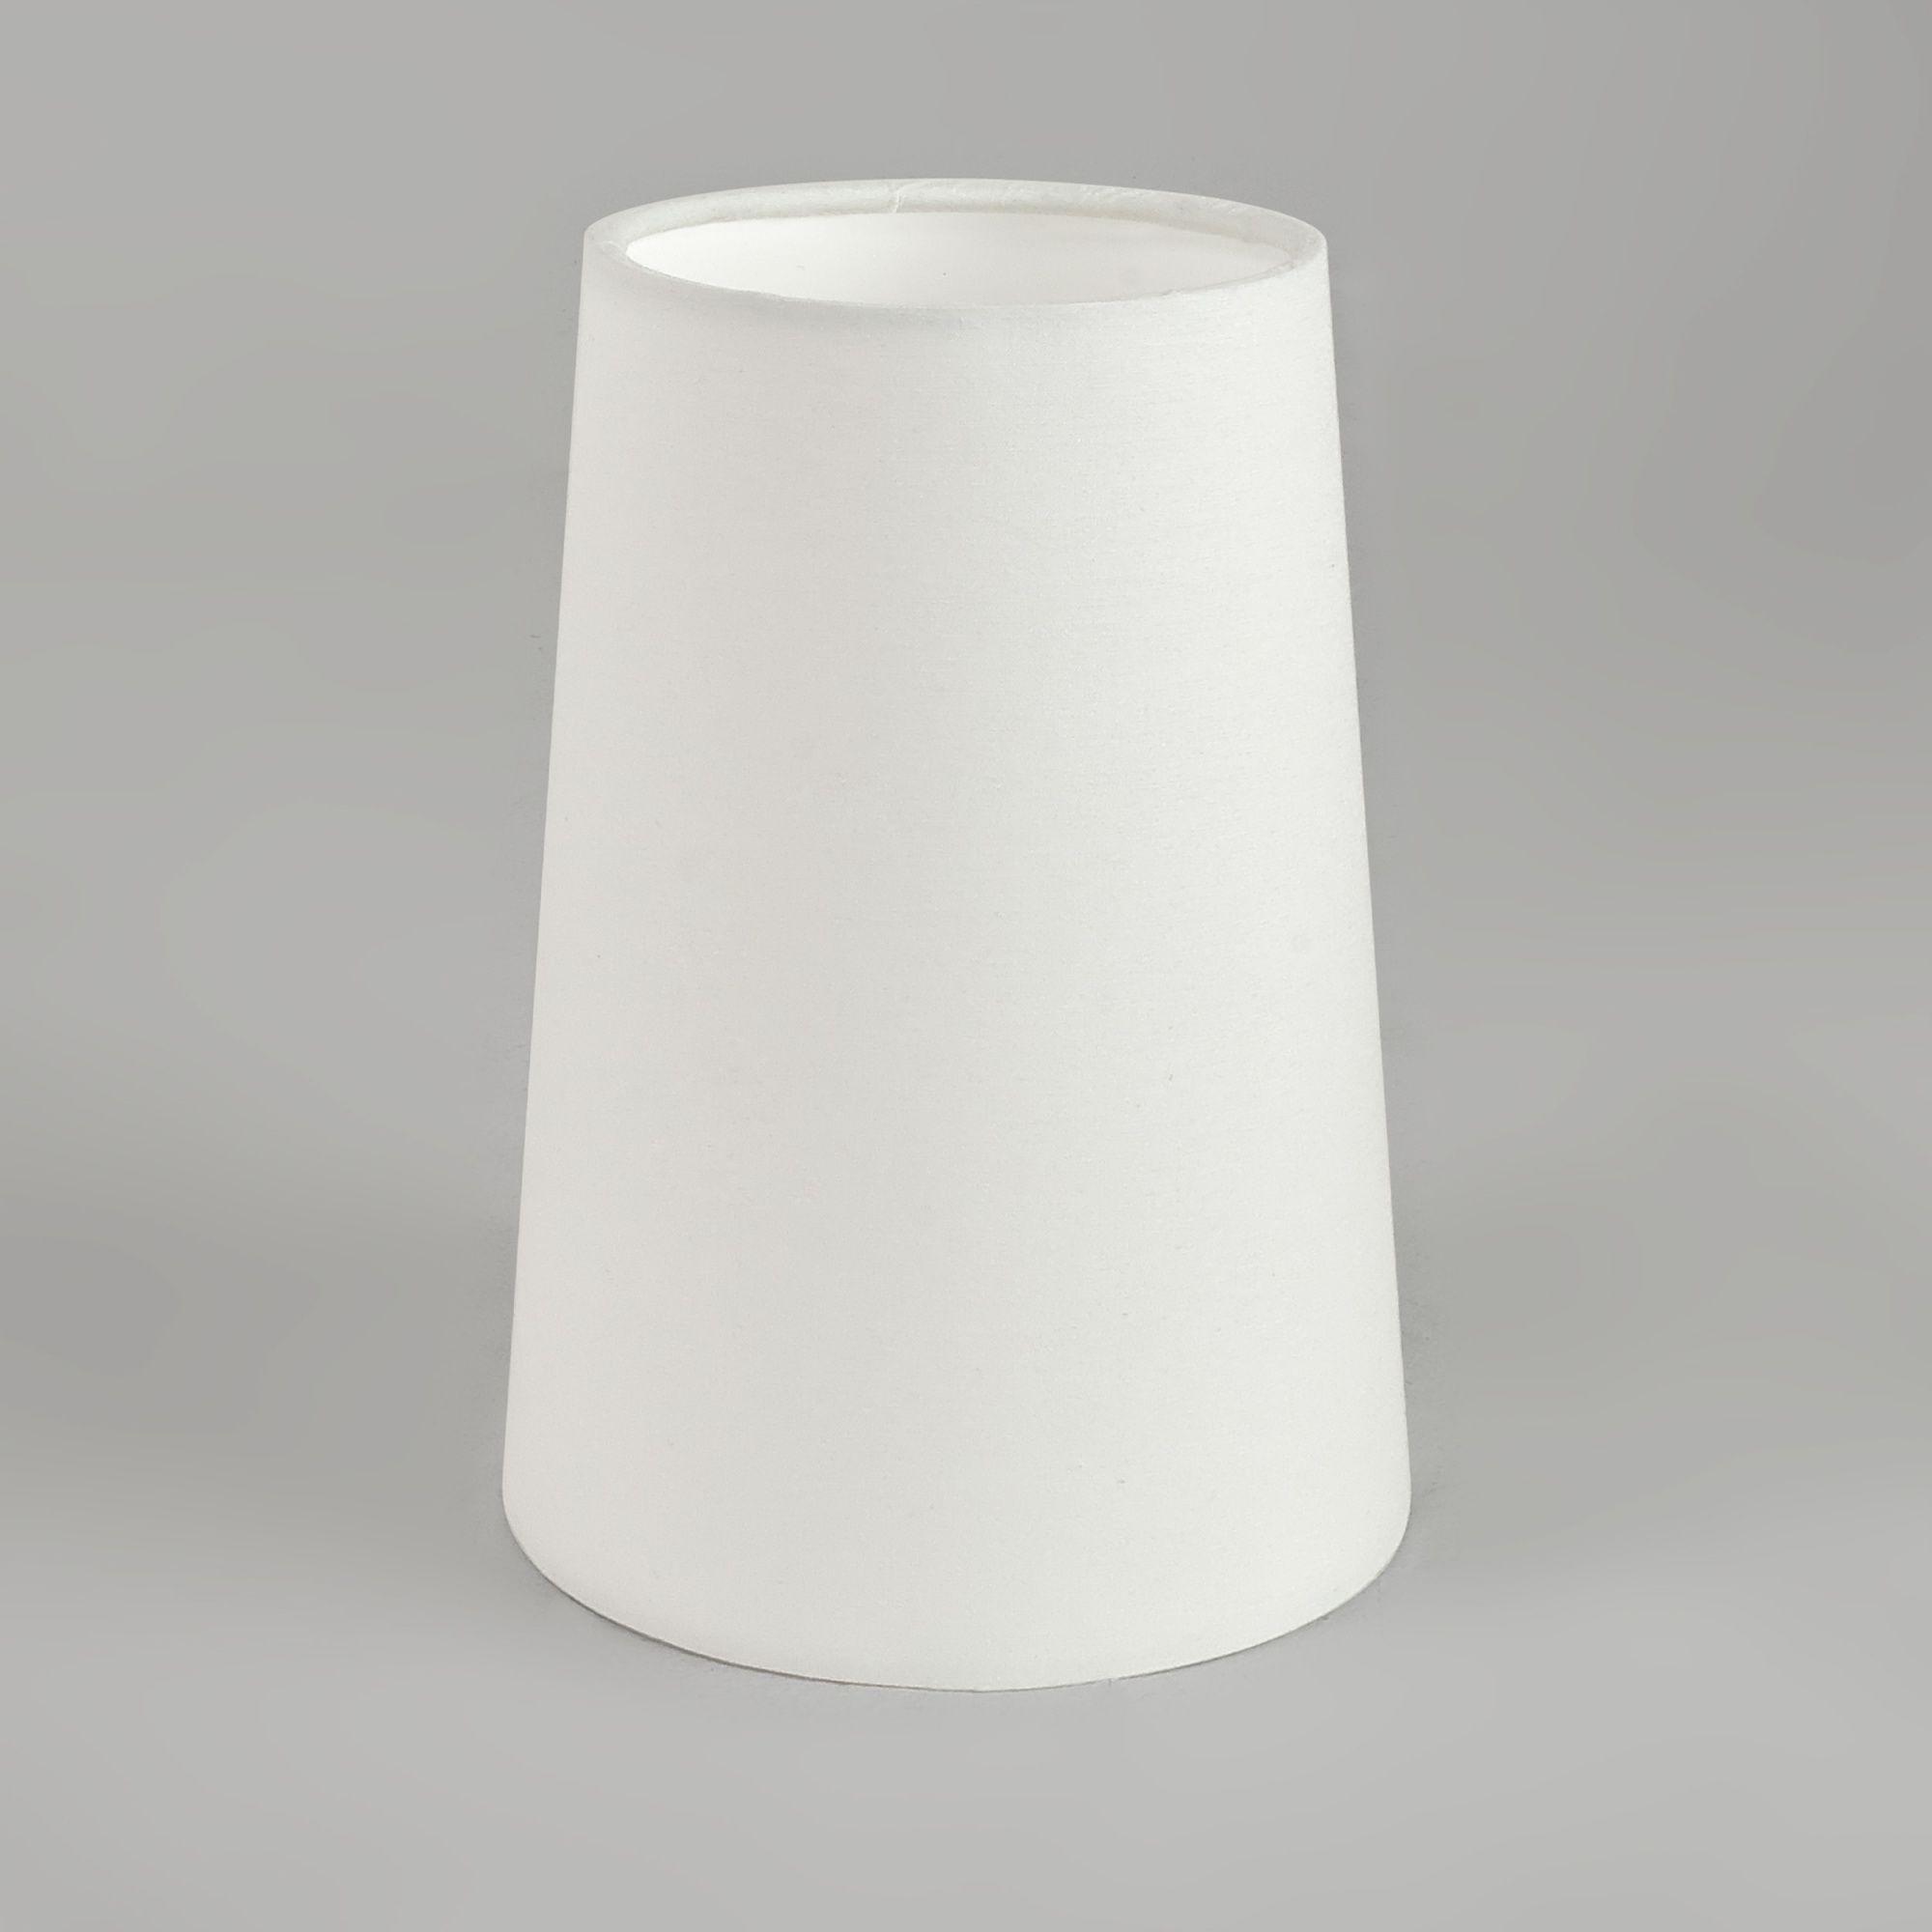 Abażur Cone 195 4076 Biały Astro Lighting